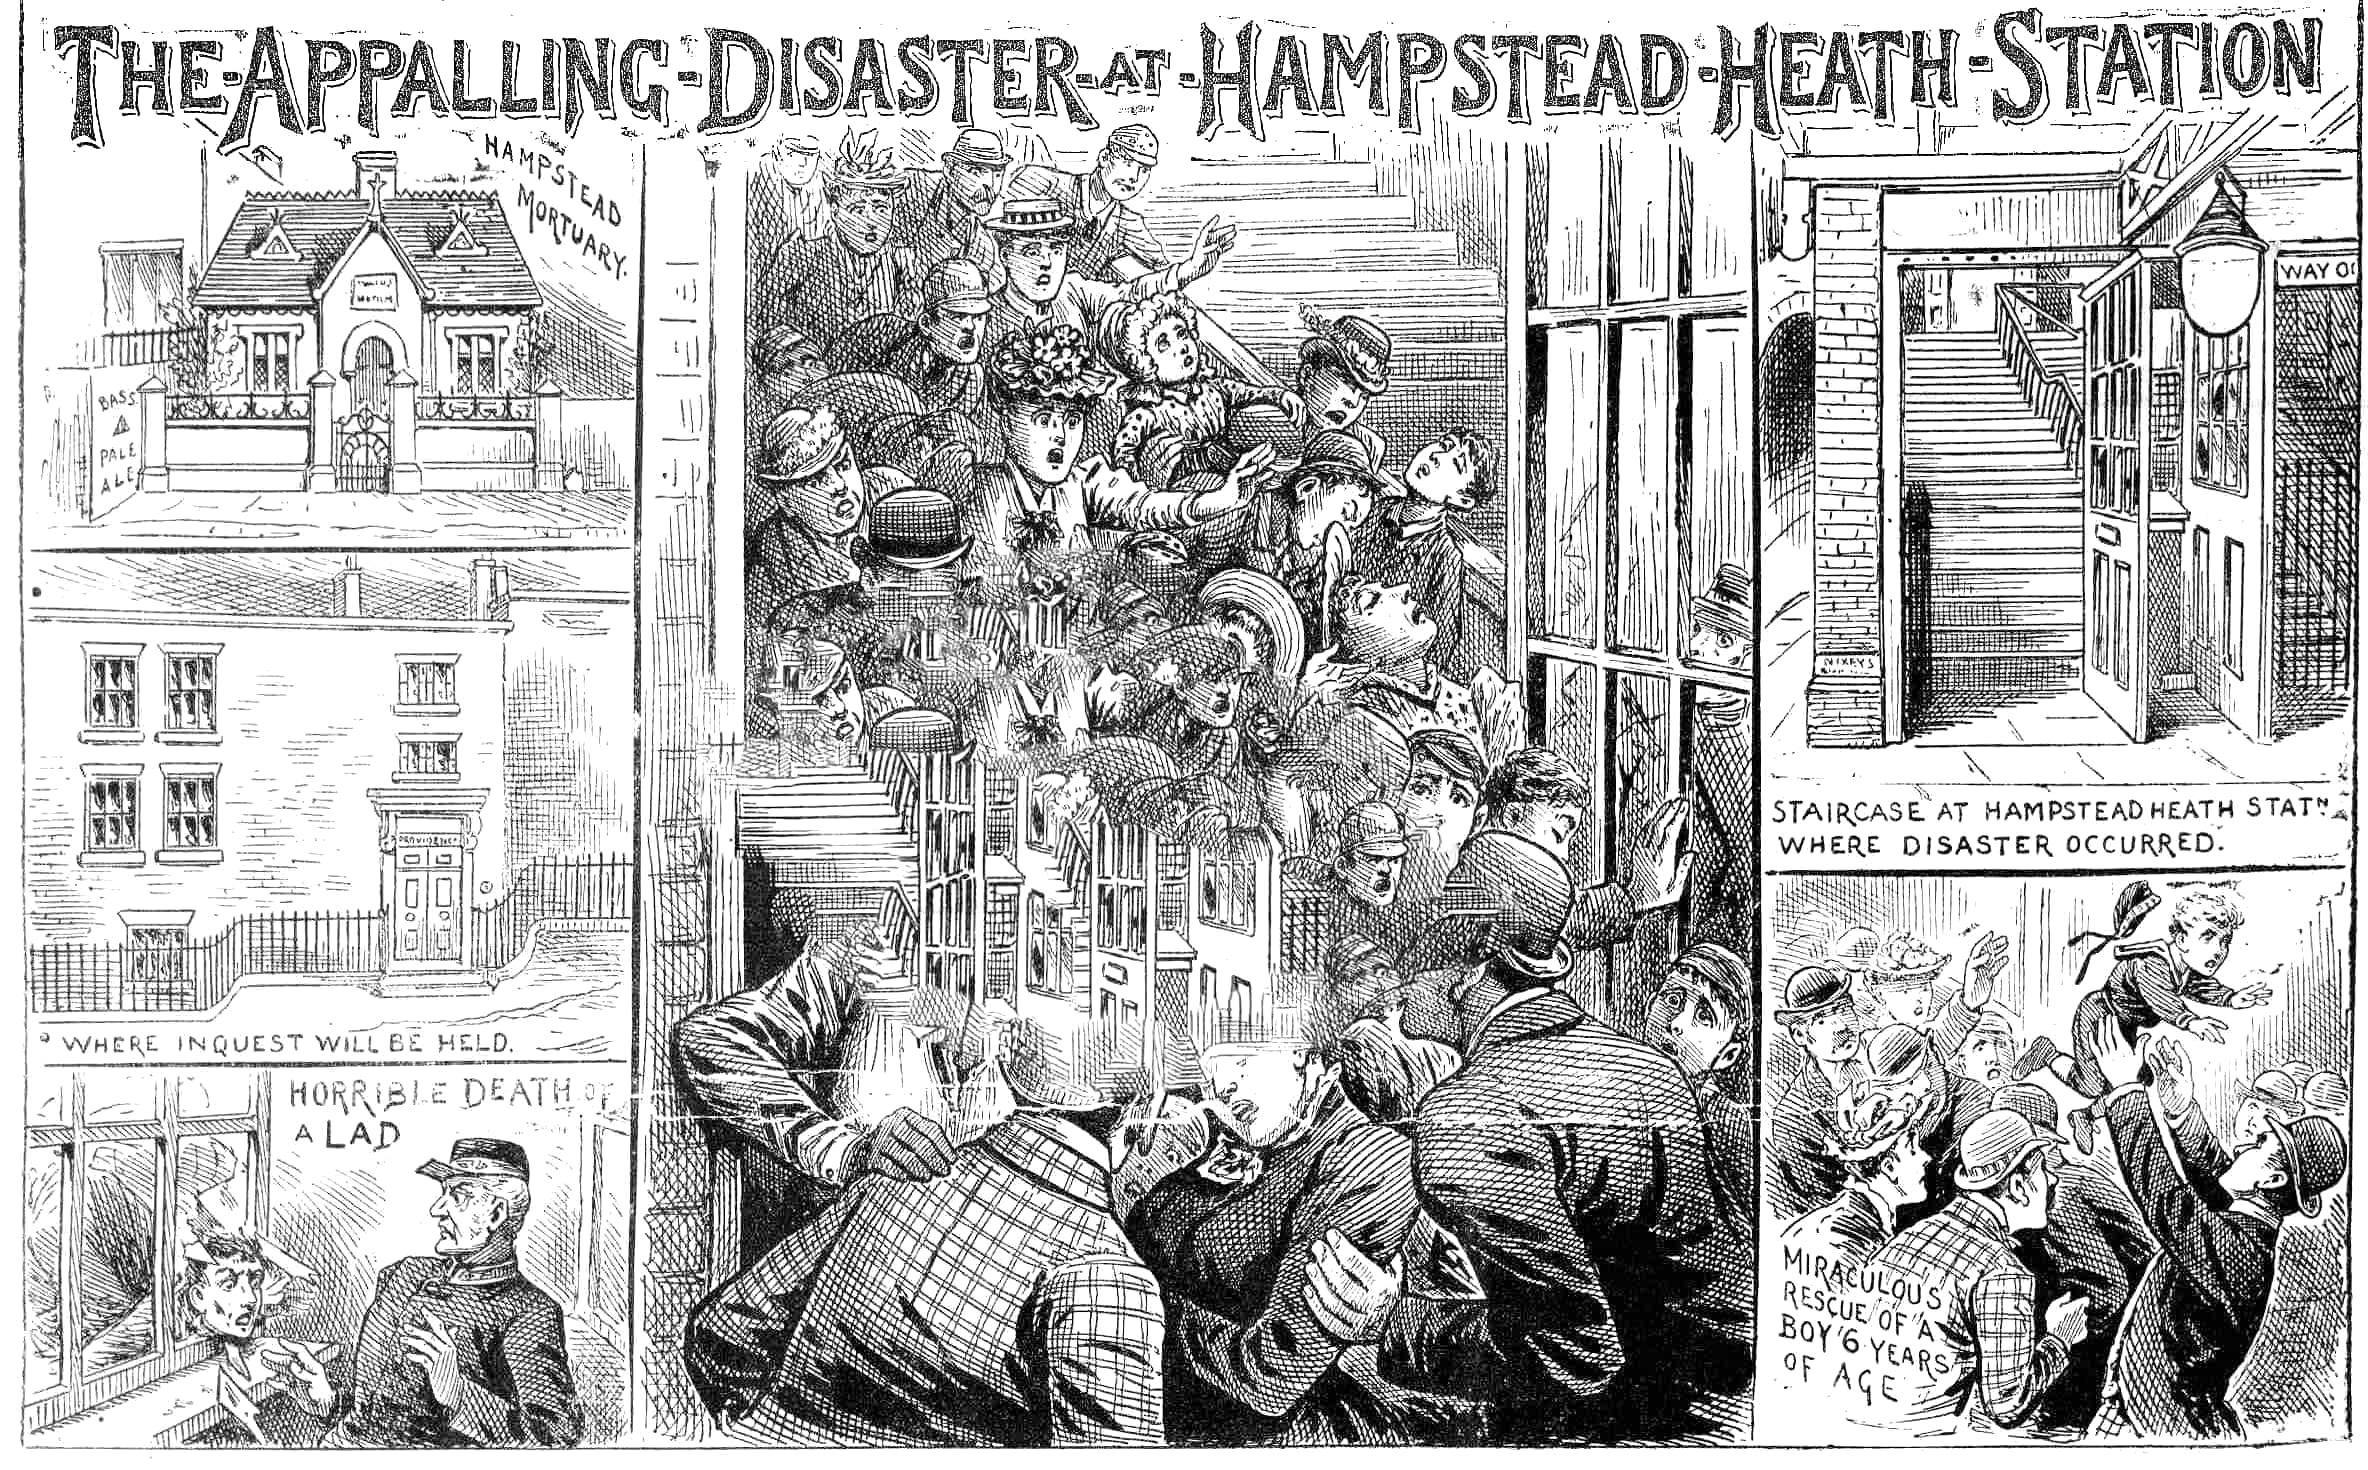 1892 Hampstead Station Disaster 2.jpg